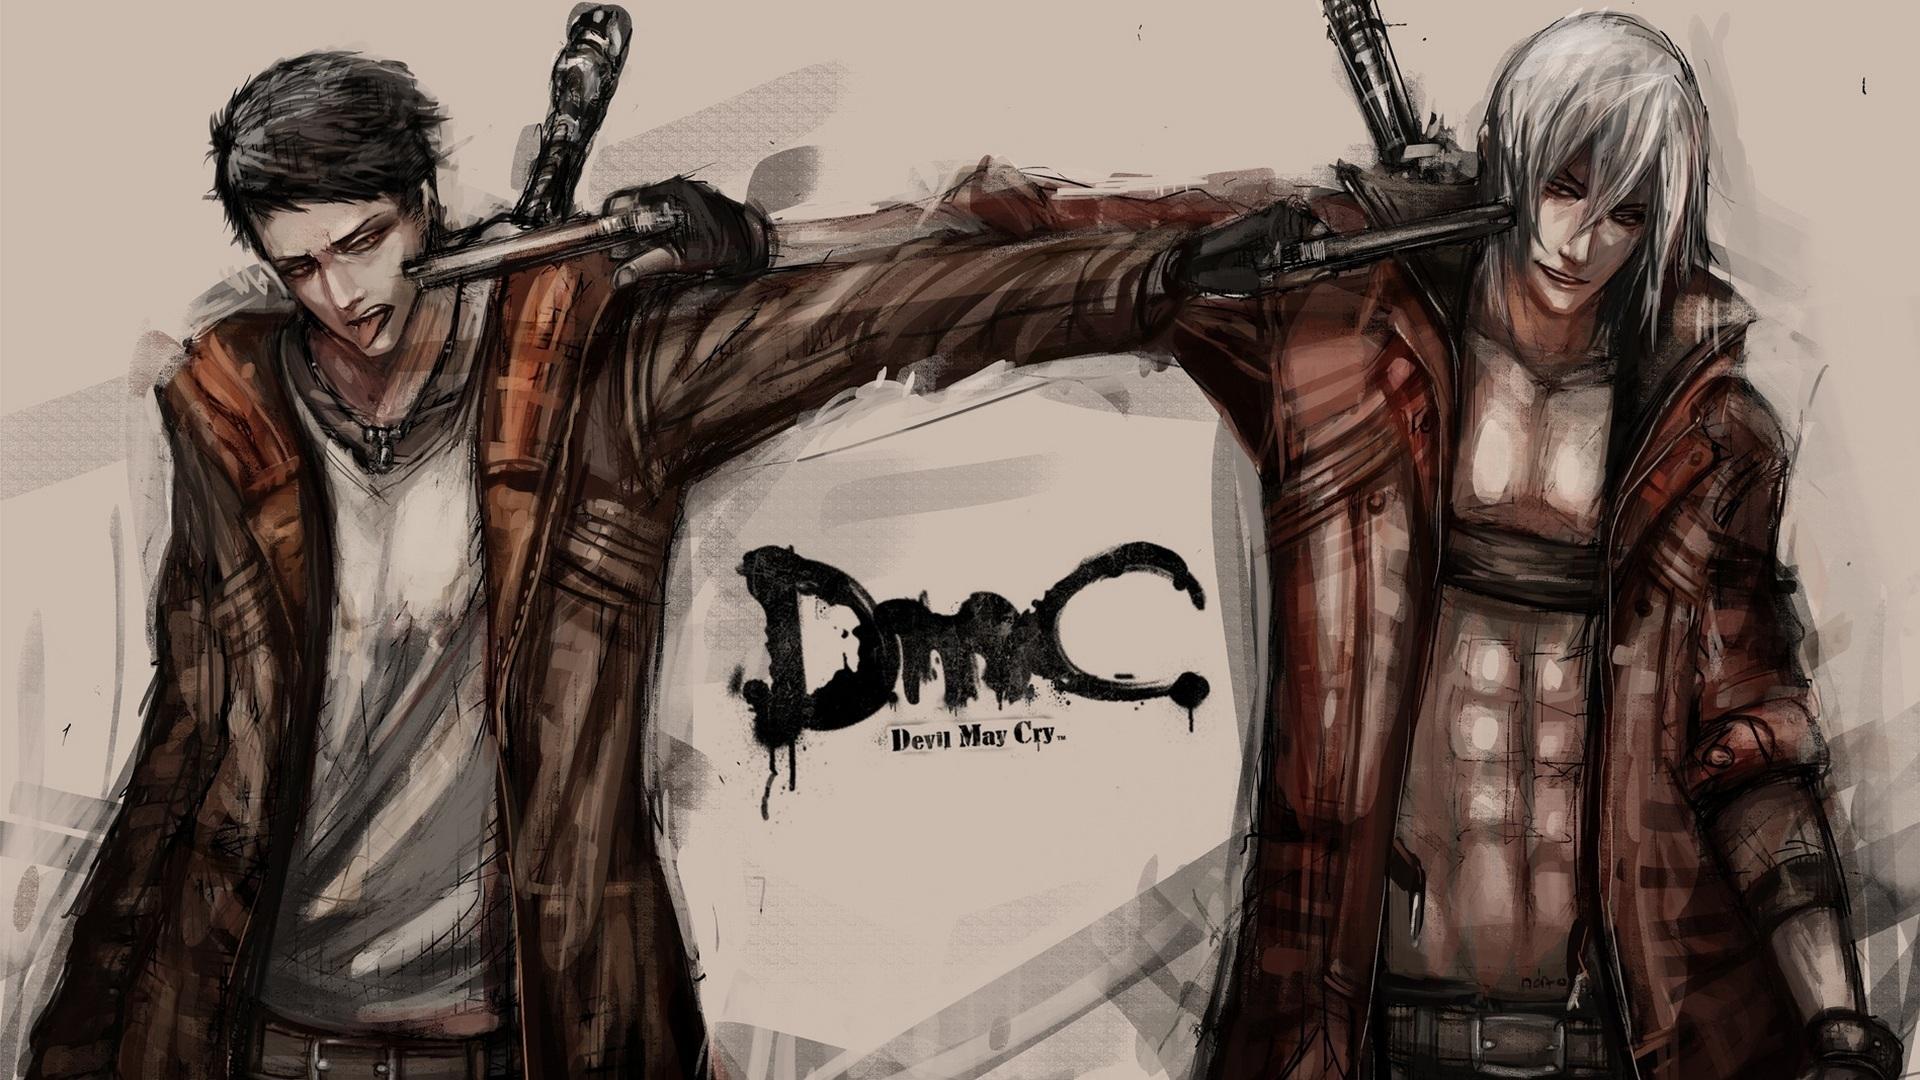 Wallpaper Dante Devil May Cry Pistols Man Jacket Games 1920x1080